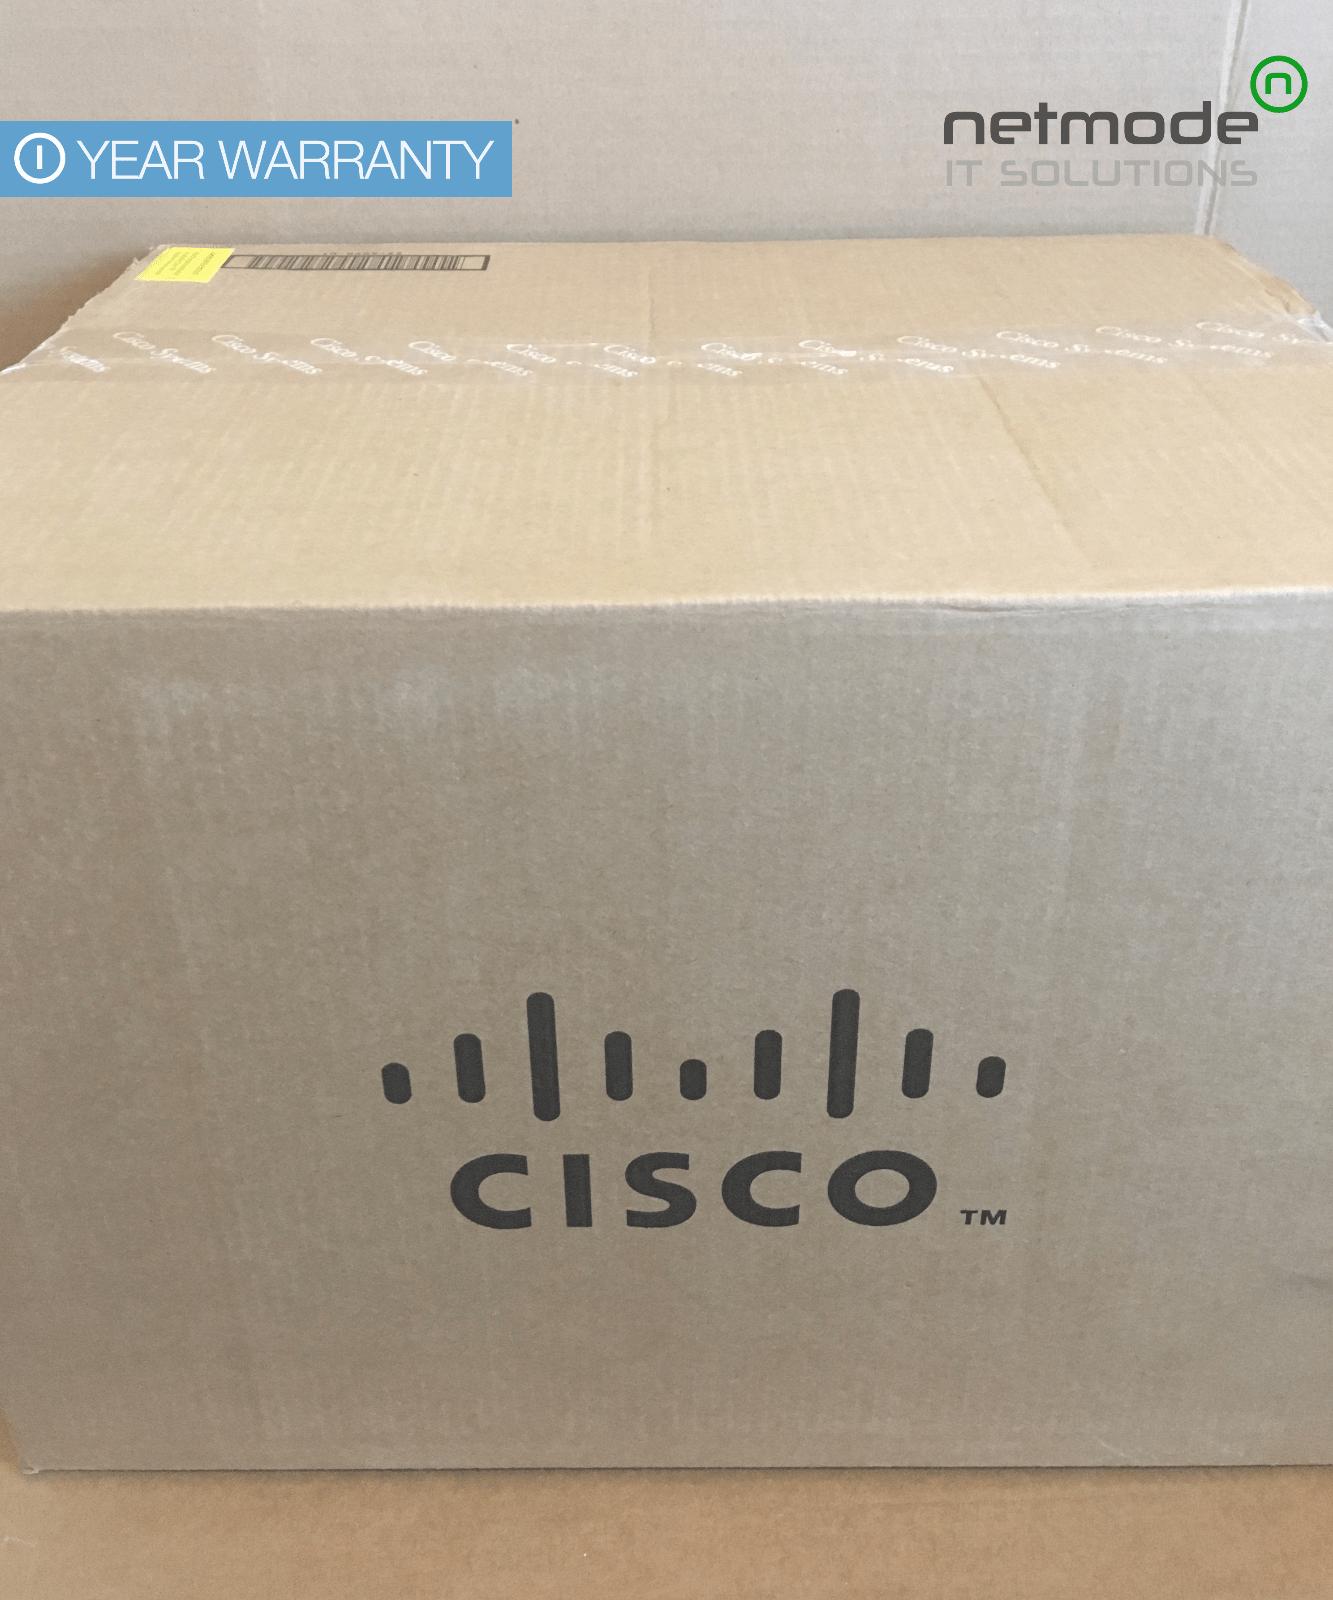 NEW Sealed 10 Pack Cisco AIR-AP2802I-B-K9 Access Point Aironet 2802i  802 11ac-New